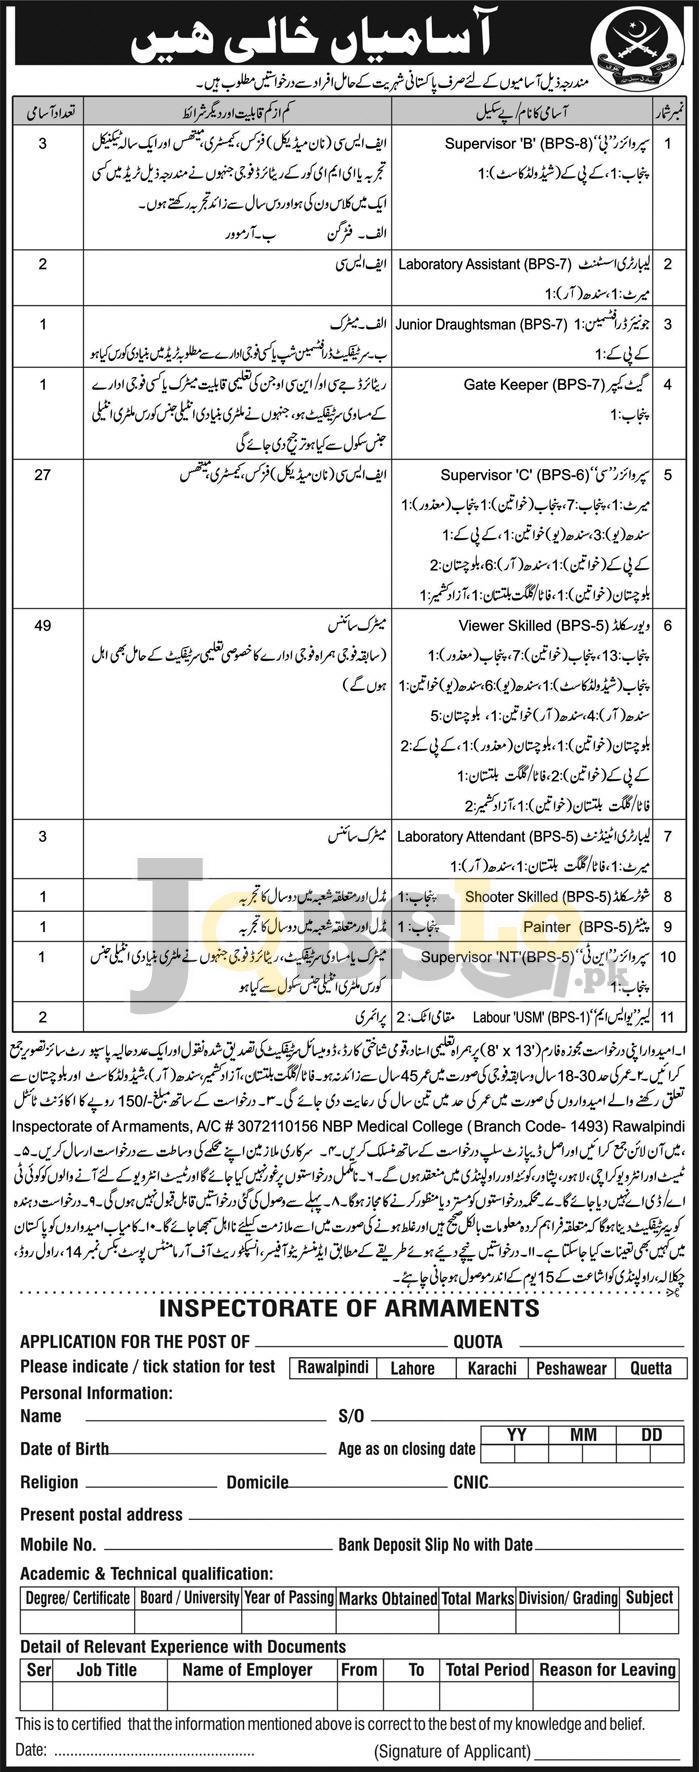 Inspectorate of Armaments Rawalpindi Jobs Application Form 2018